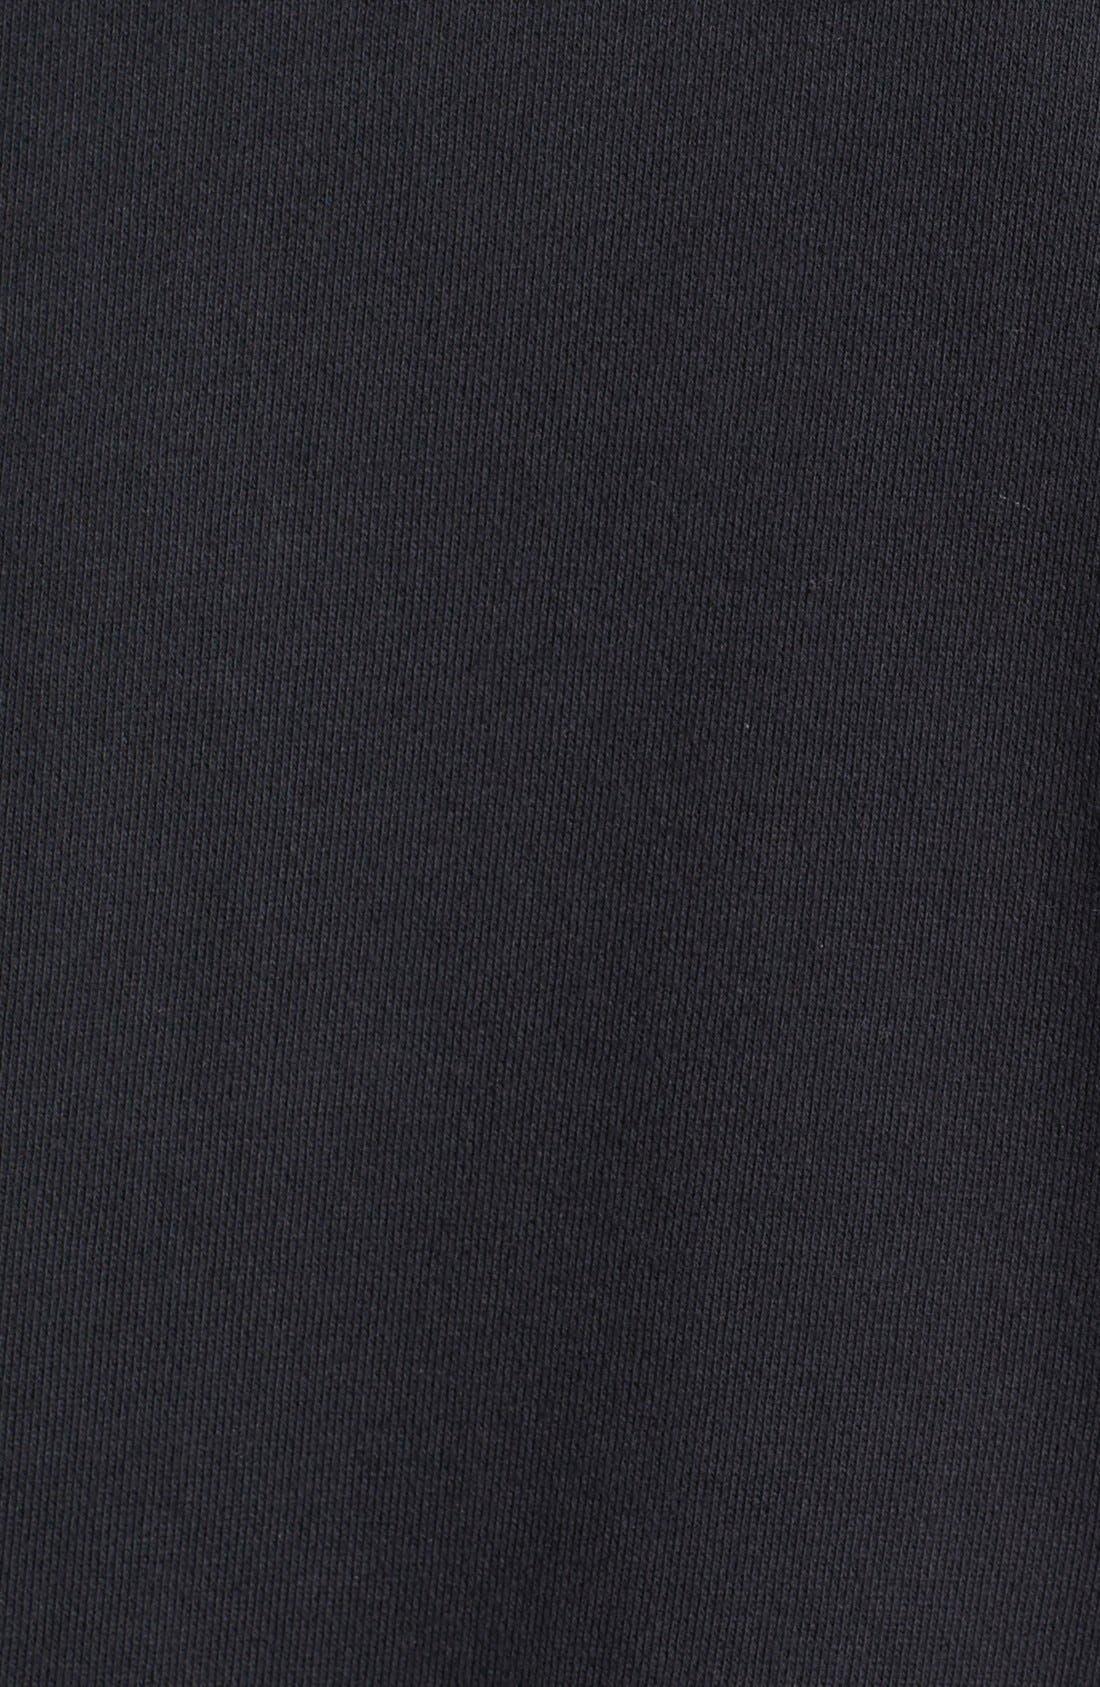 Alternate Image 3  - Mitchell & Ness 'San Antonio Spurs' Hoodie